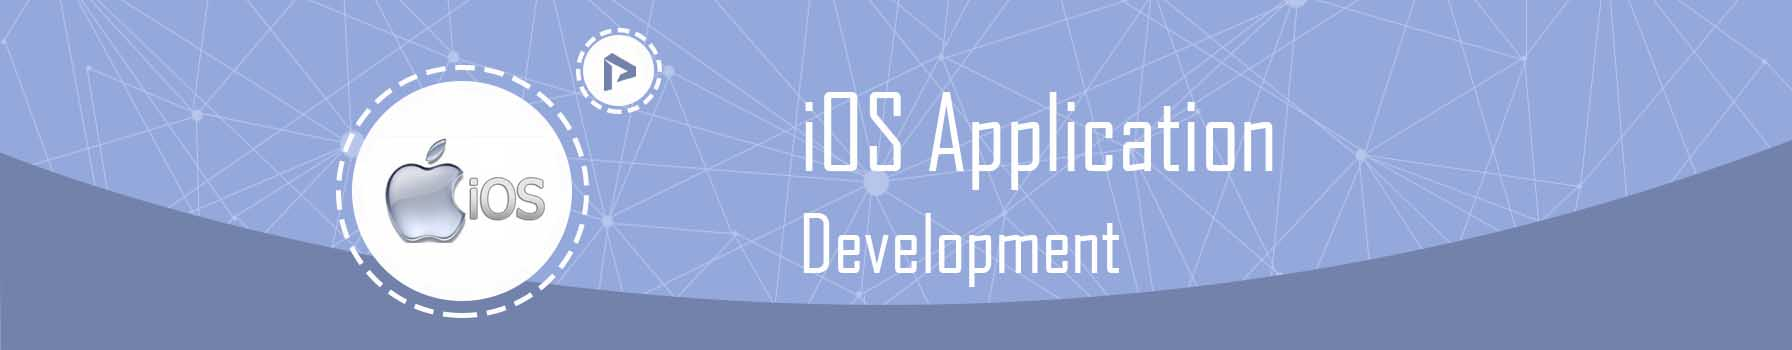 ios-application-development.jpg